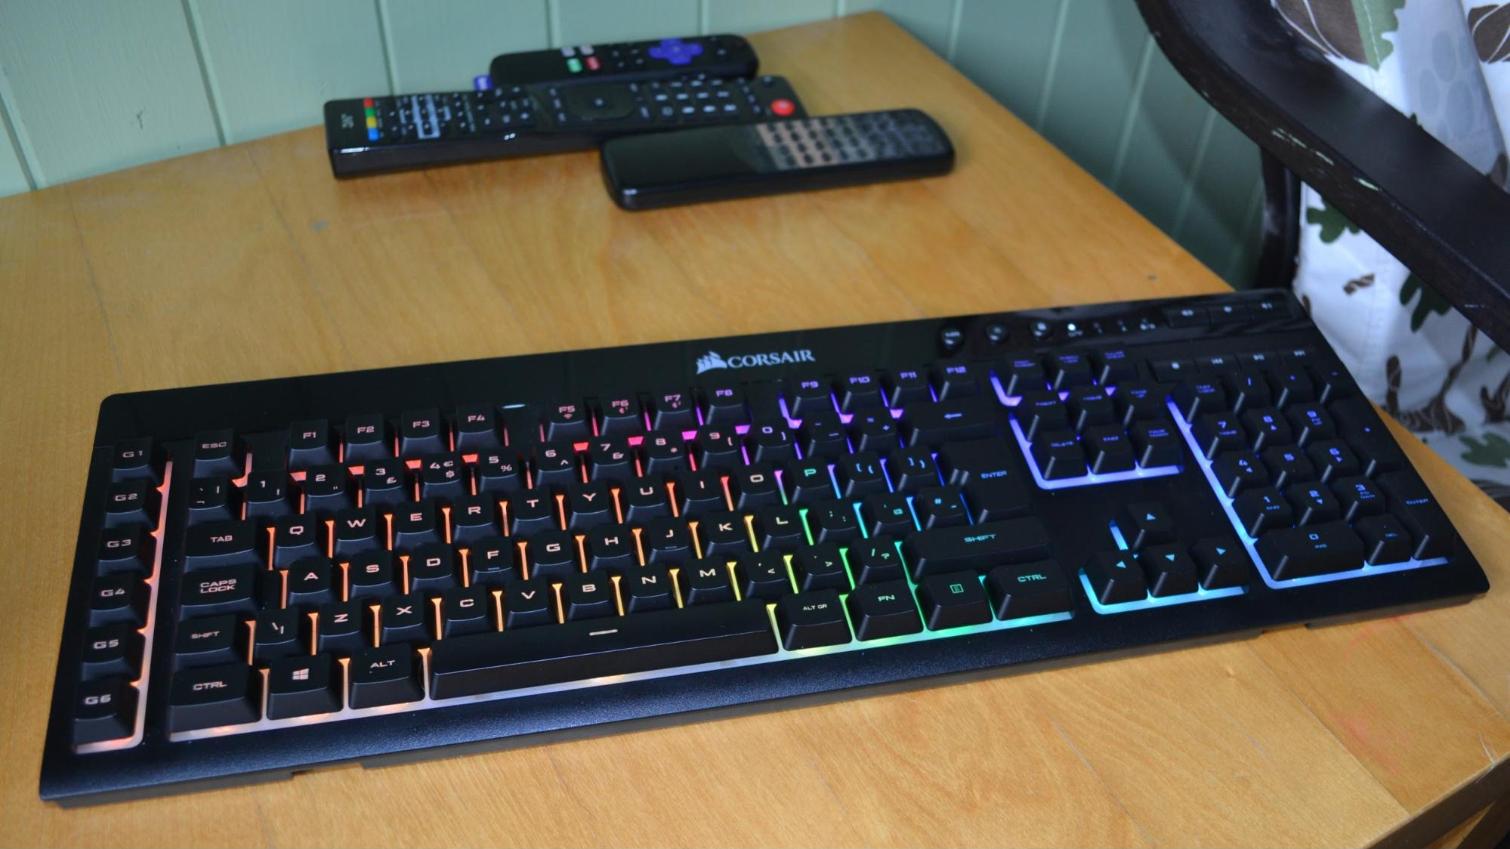 Corsair K57 Rgb Wireless Gaming Keyboard Review Premium Membrane Tom S Hardware Tom S Hardware